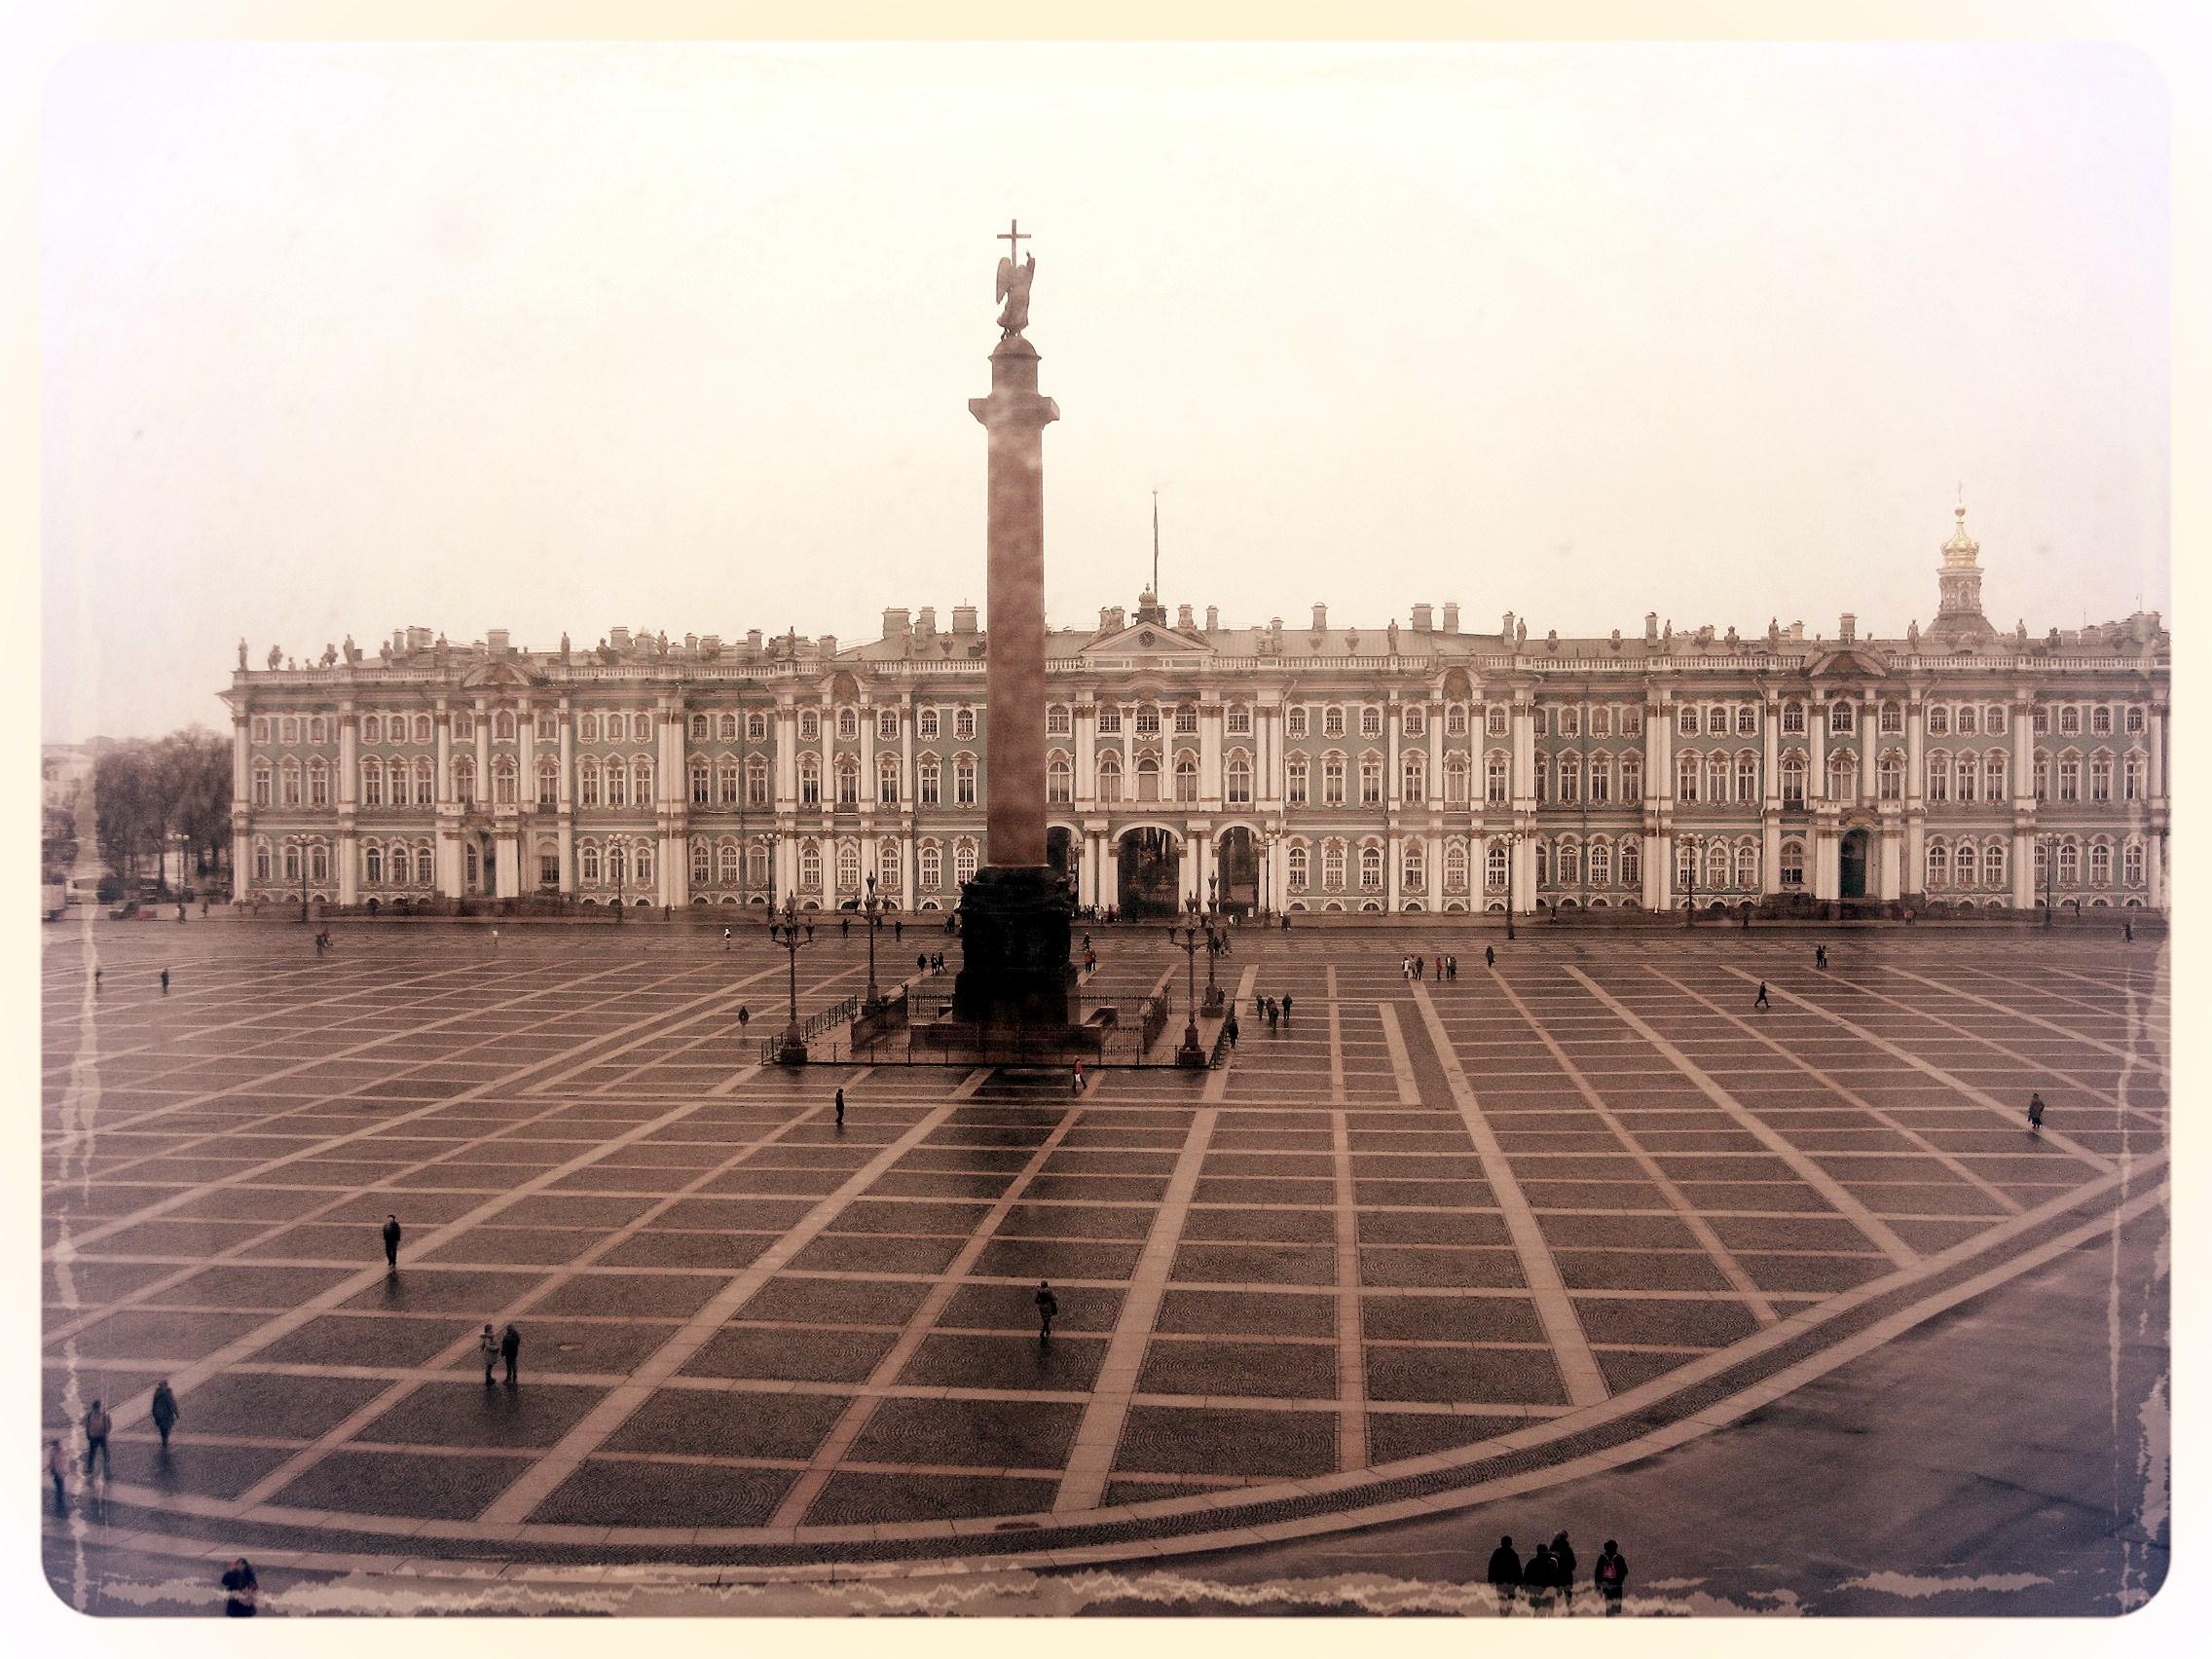 Неподвижен сон спокойный Александрийского столпа